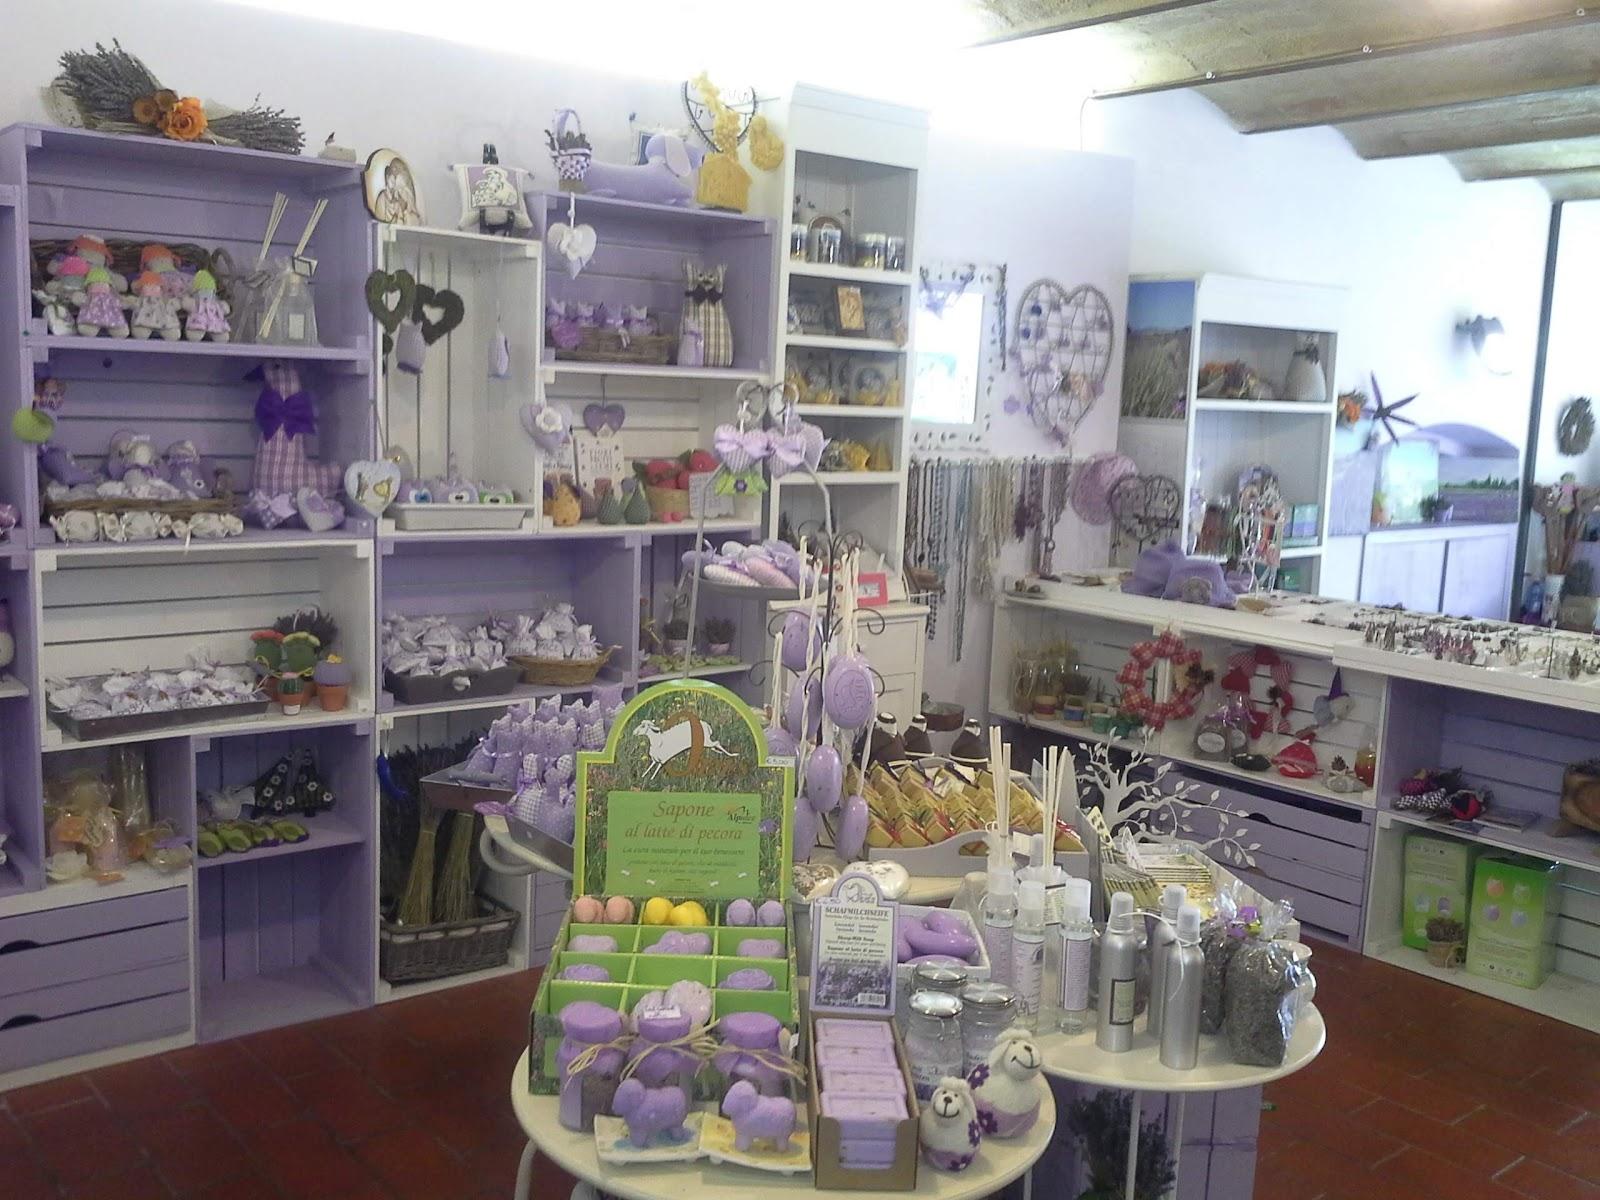 Idee Arredamento Negozio: Arredamento negozio angolo bambini.